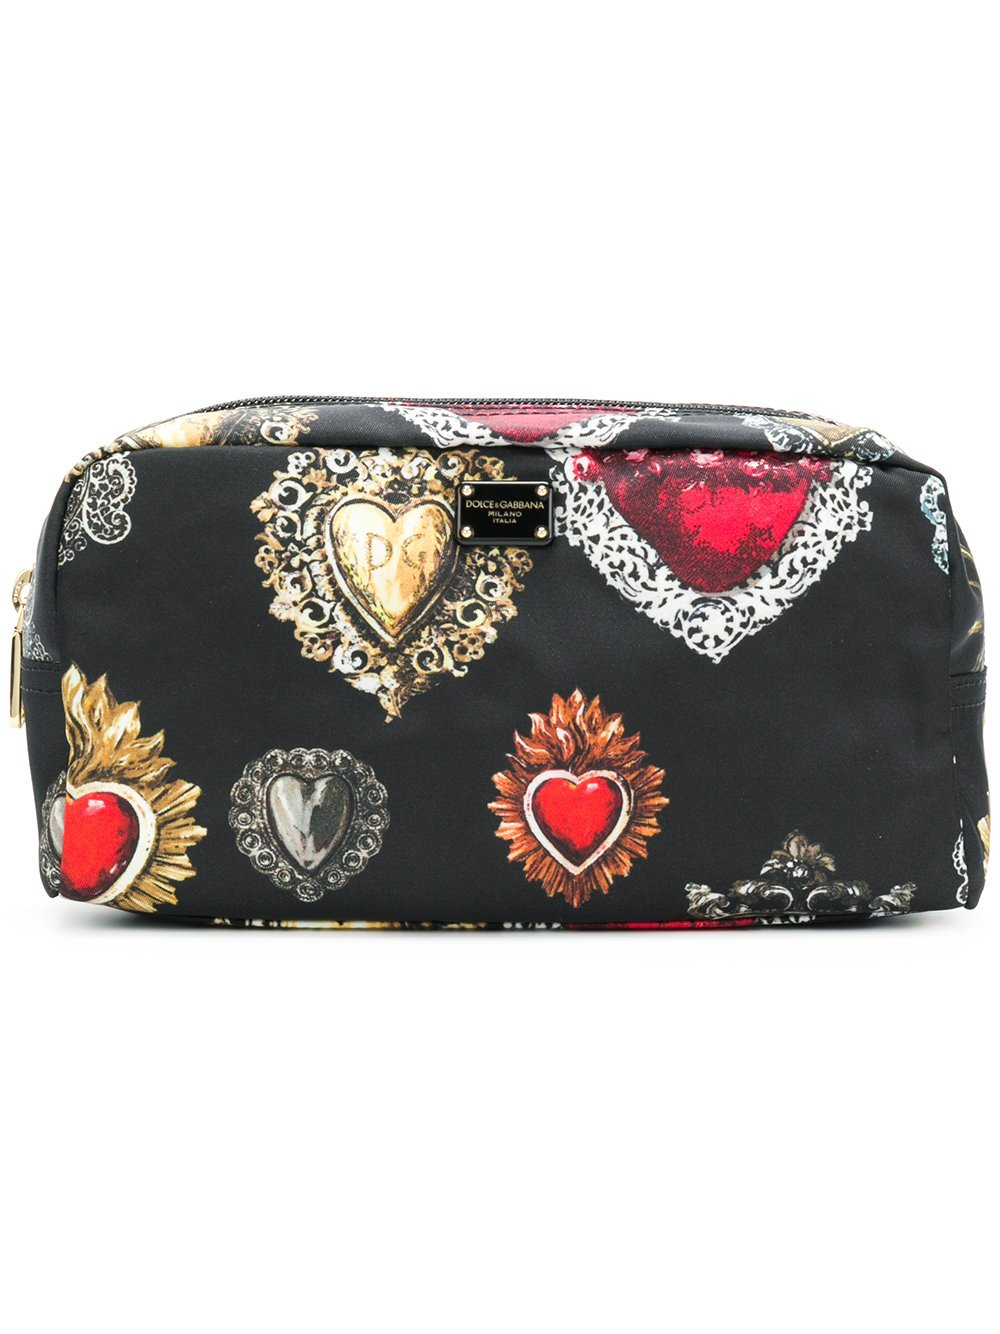 Dolce E Gabbana Women's Bi0932an968hnm69 Black Polyamide Beauty Case